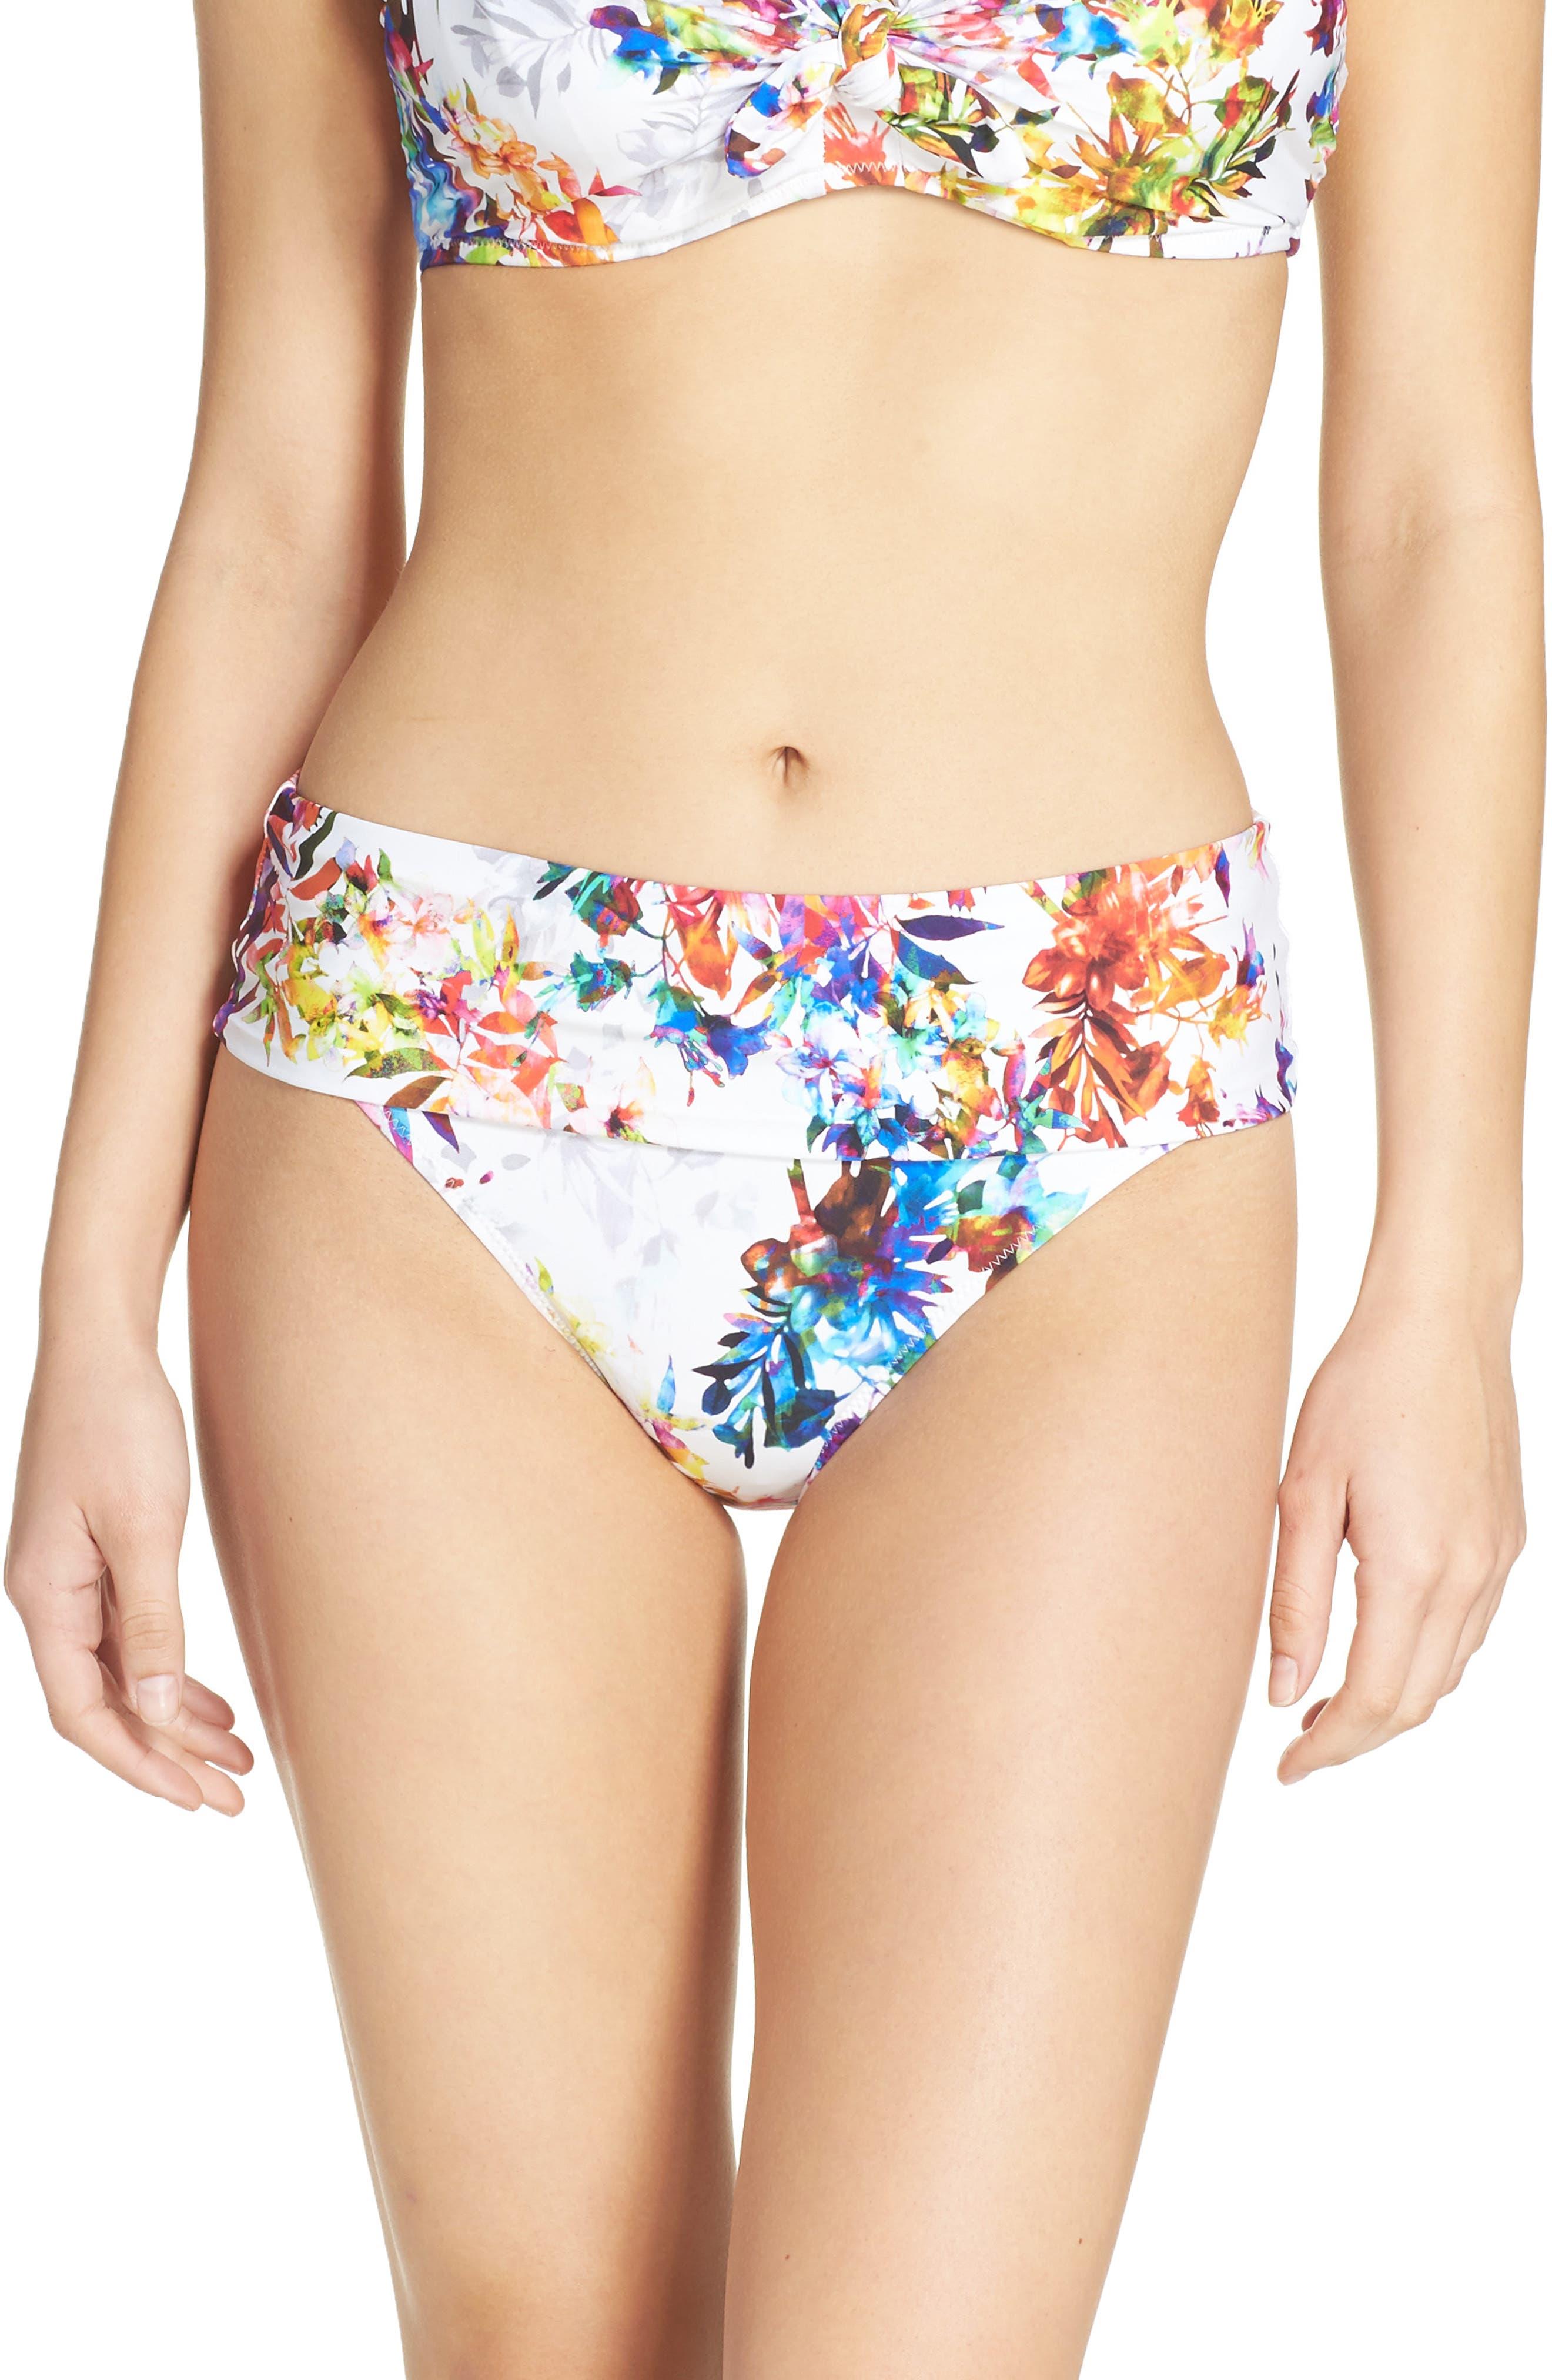 Agra Foldover Waist Bikini Bottoms,                         Main,                         color, White Multi